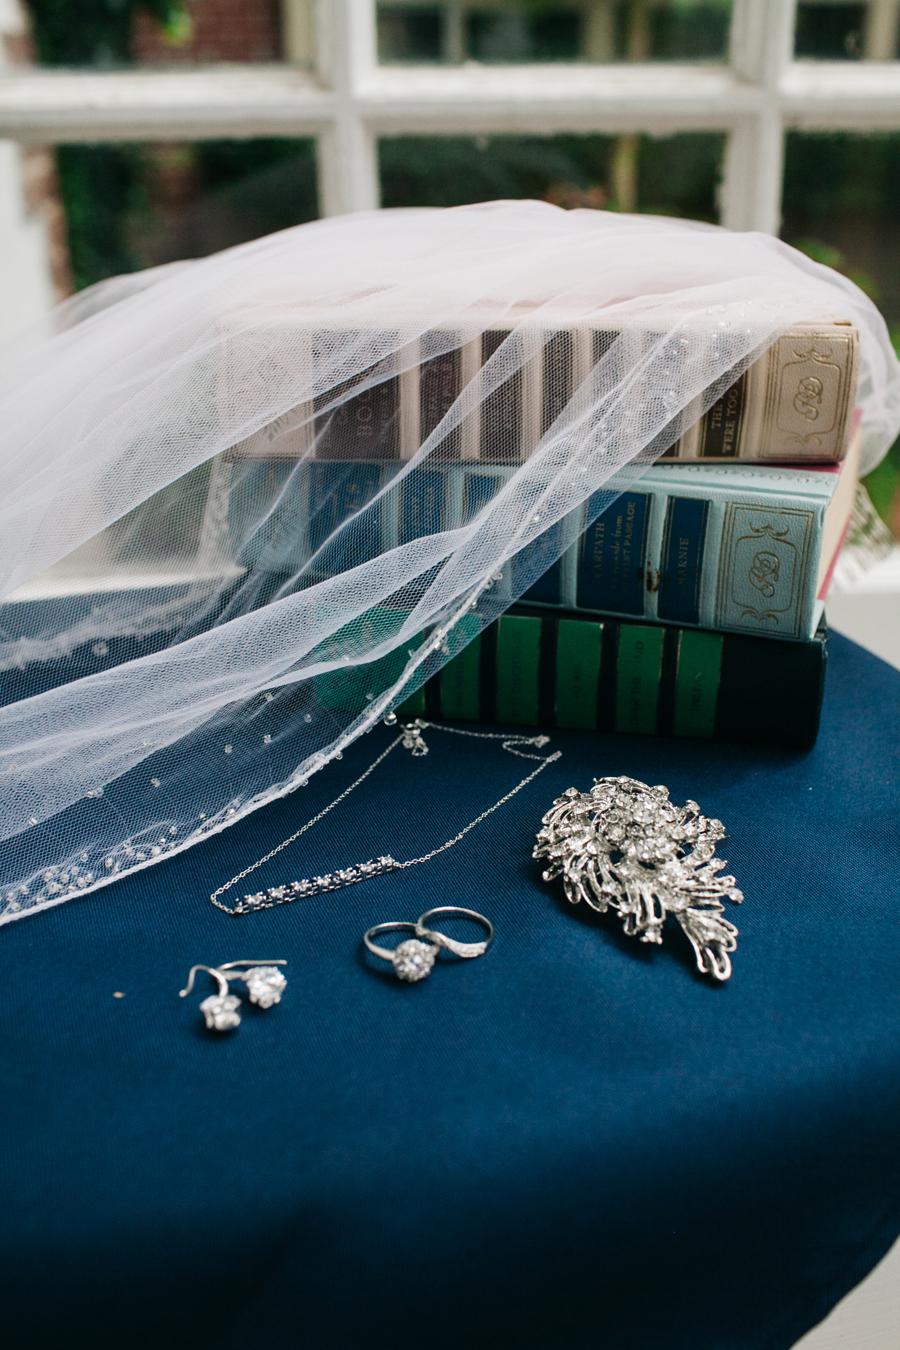 004-lairmont-manor-bellingham-washington-wedding-katheryn-moran-photography.jpg